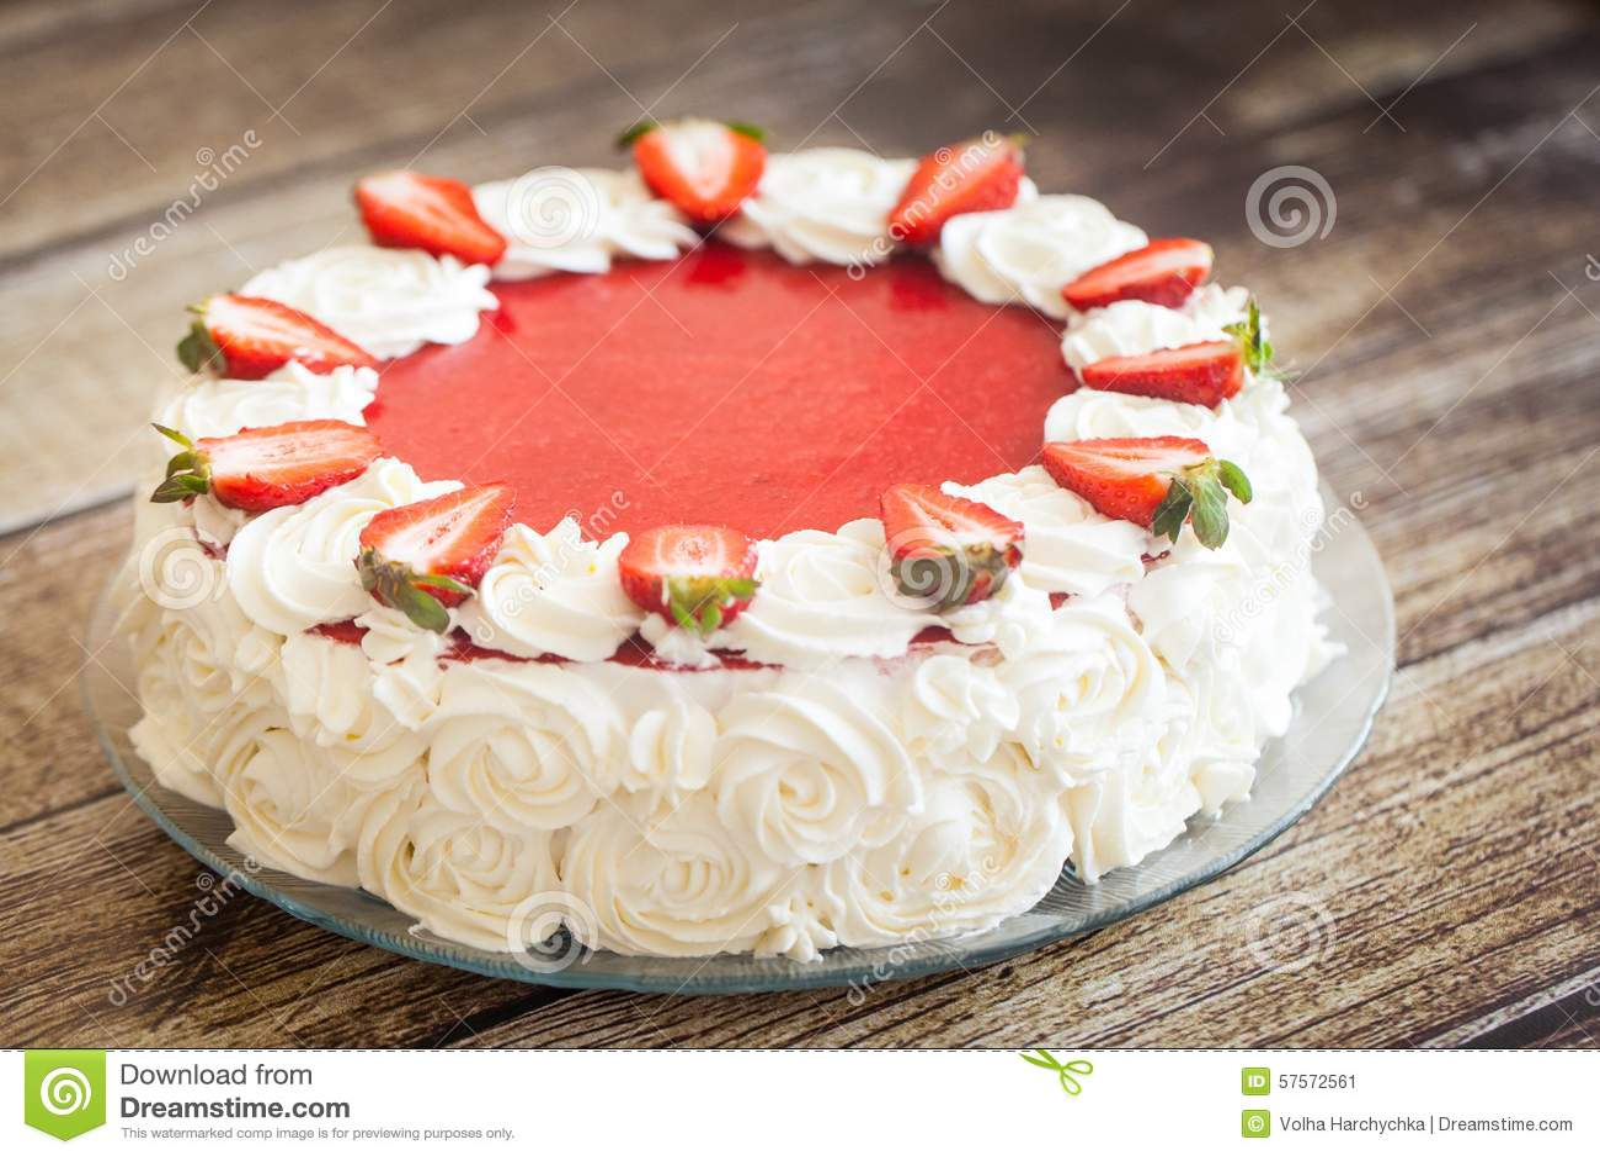 Birthday Cake With Strawberries And Cream Roses Stock Image Image